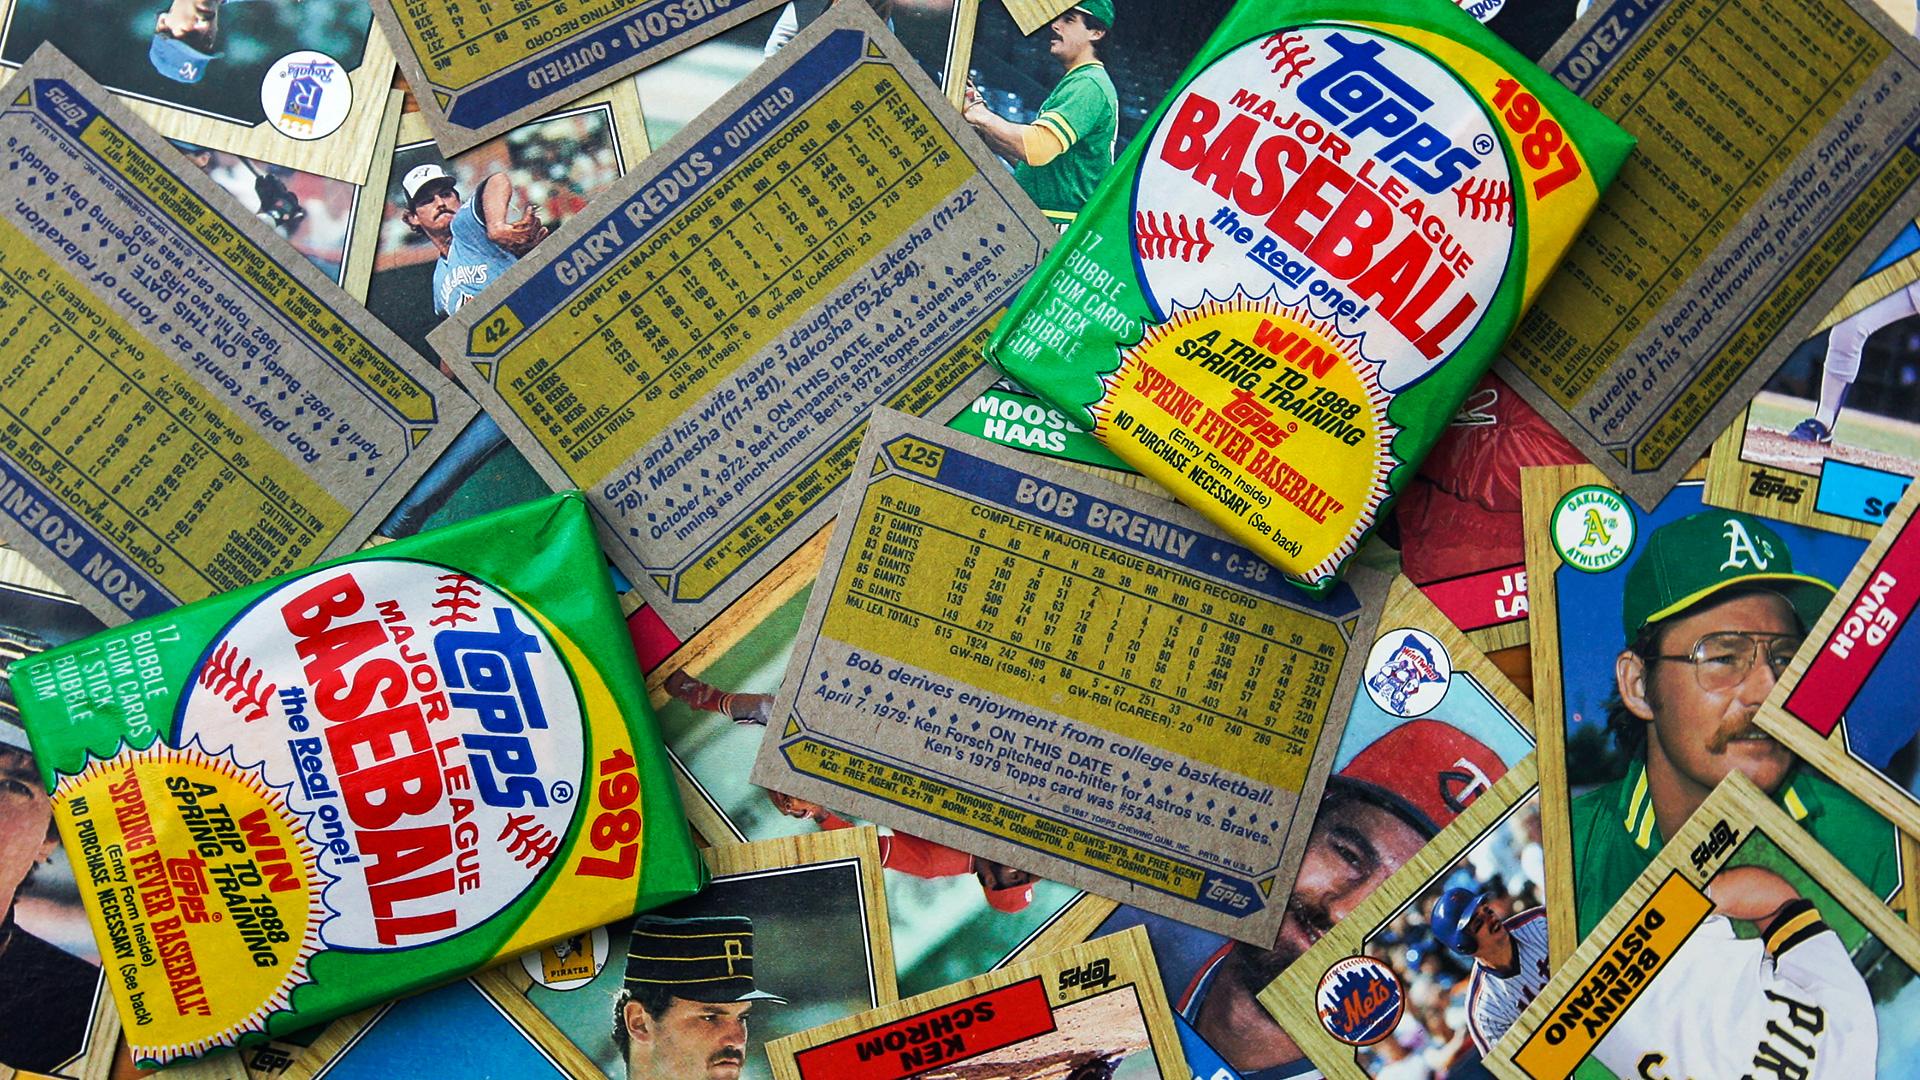 1987-Cards-071714-AP-FTR.jpg